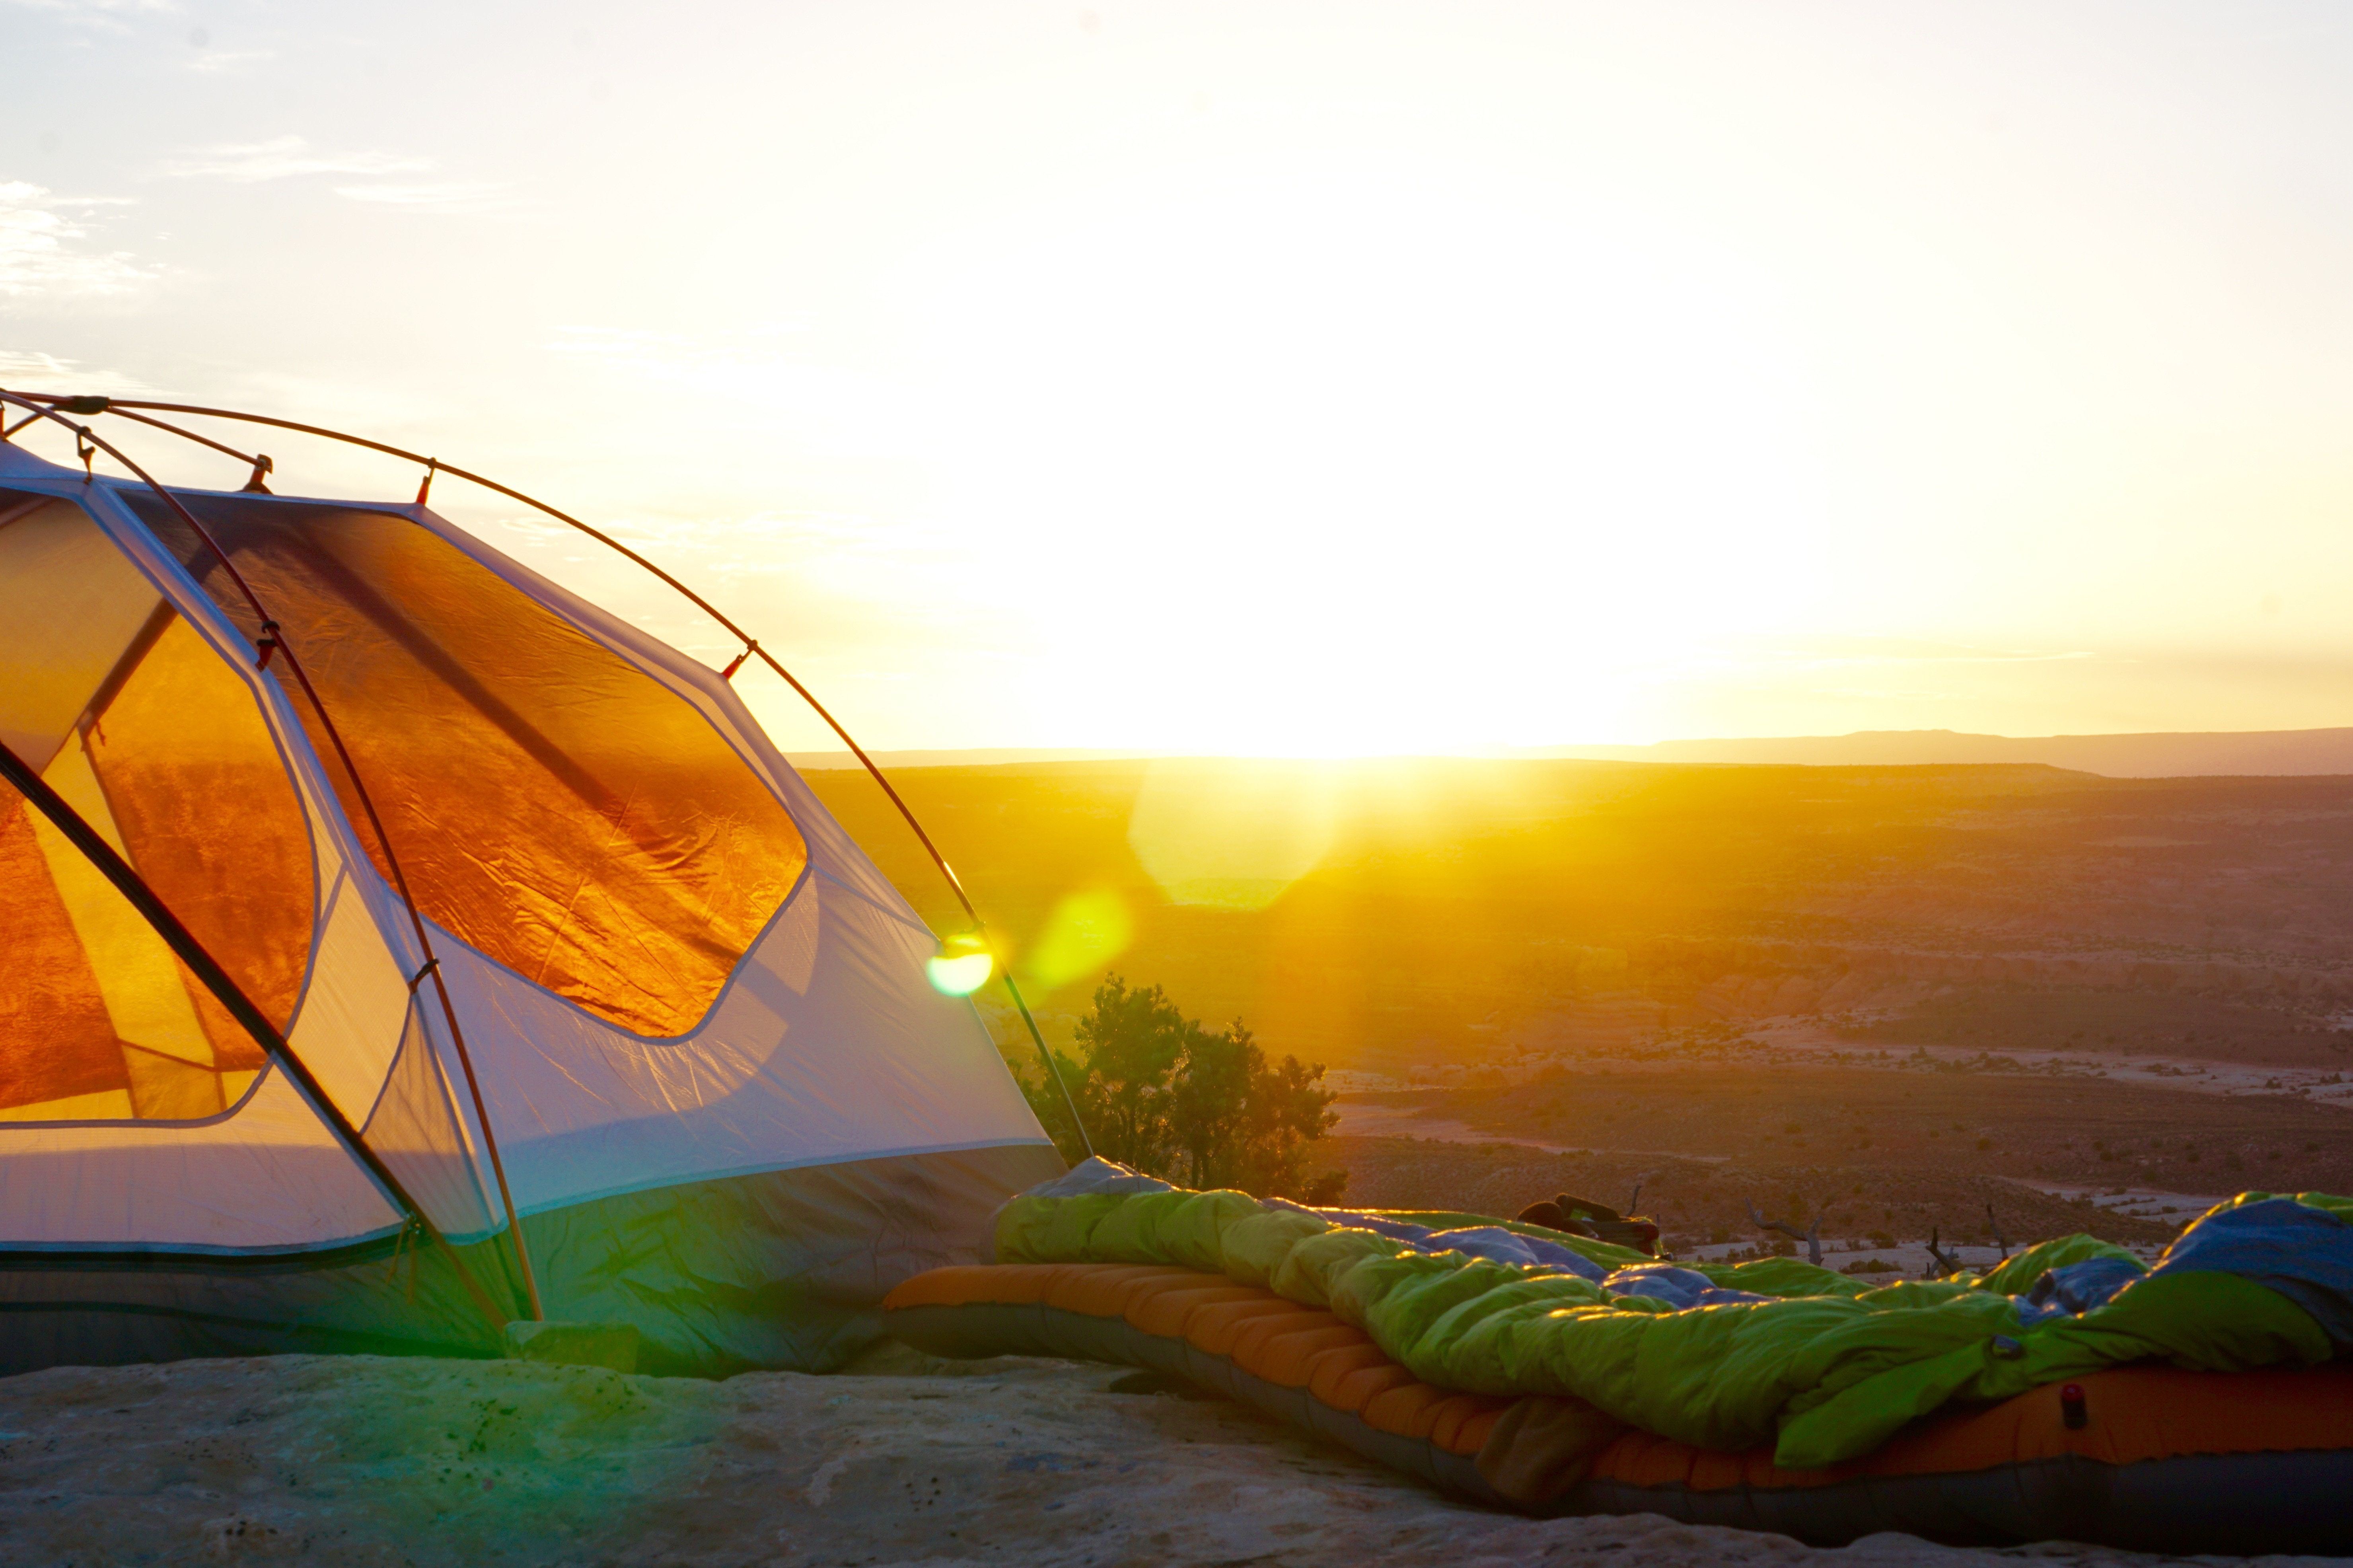 Tente sur un terrain de camping